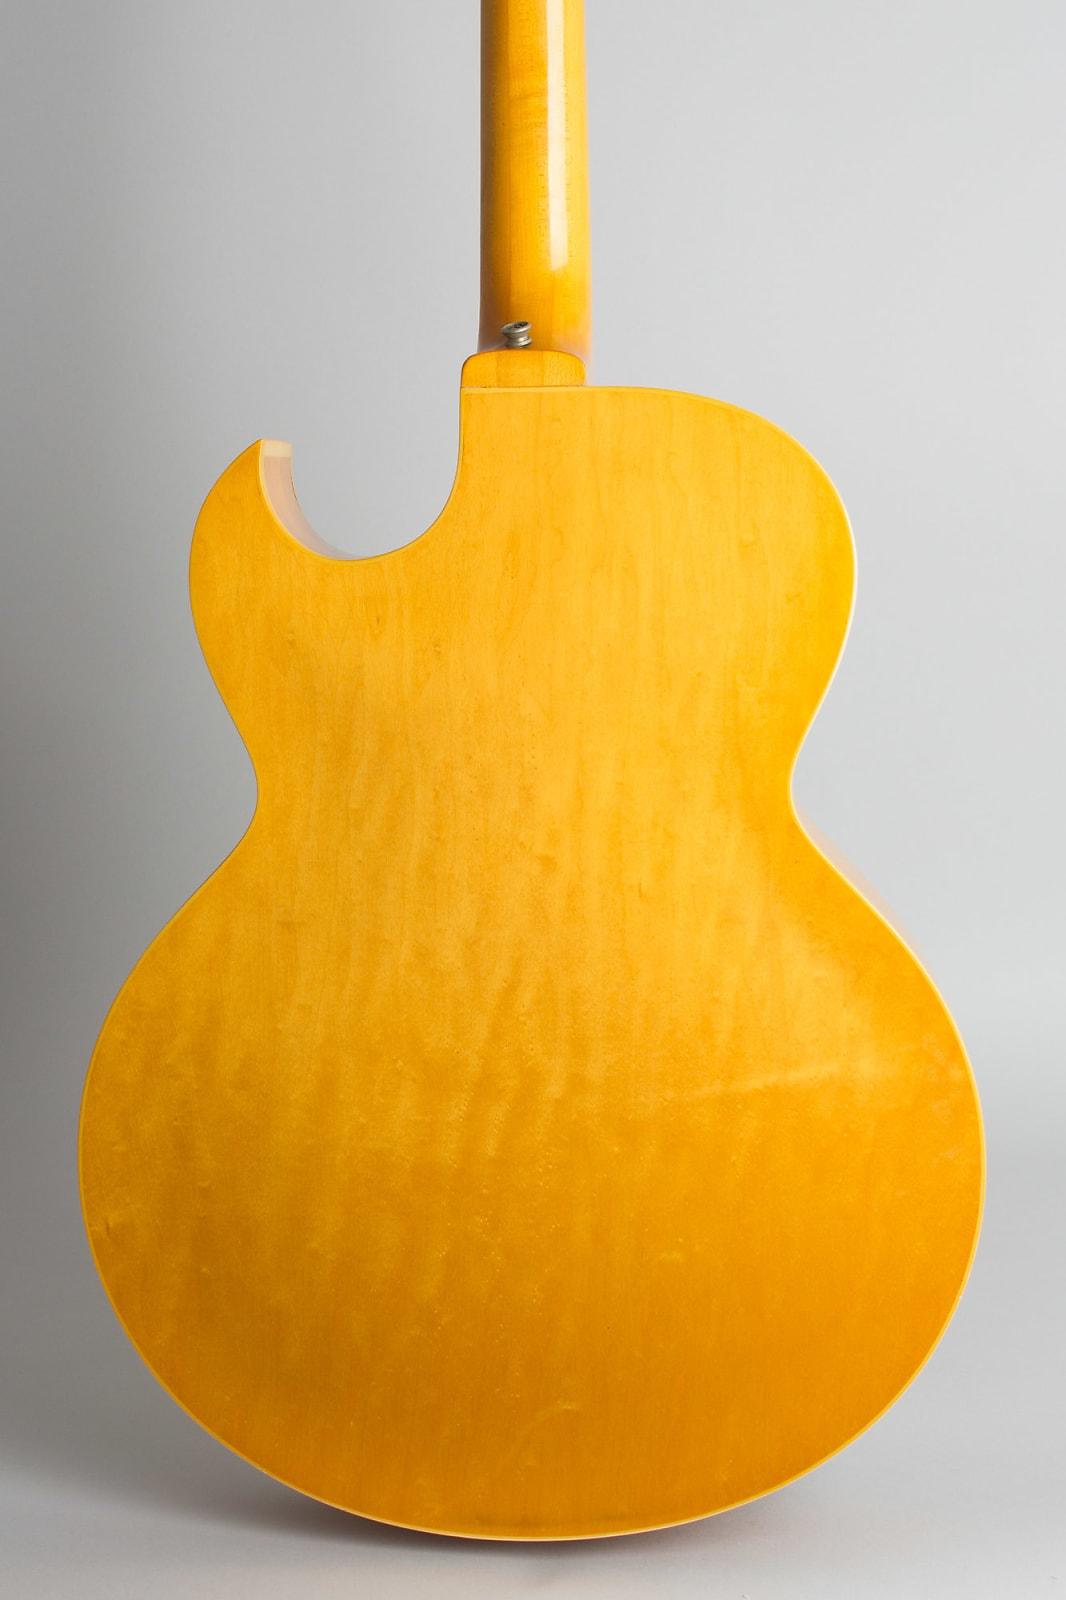 Gibson  ES-175D Arch Top Hollow Body Electric Guitar (1979), ser. #72489109, black tolex hard shell case.